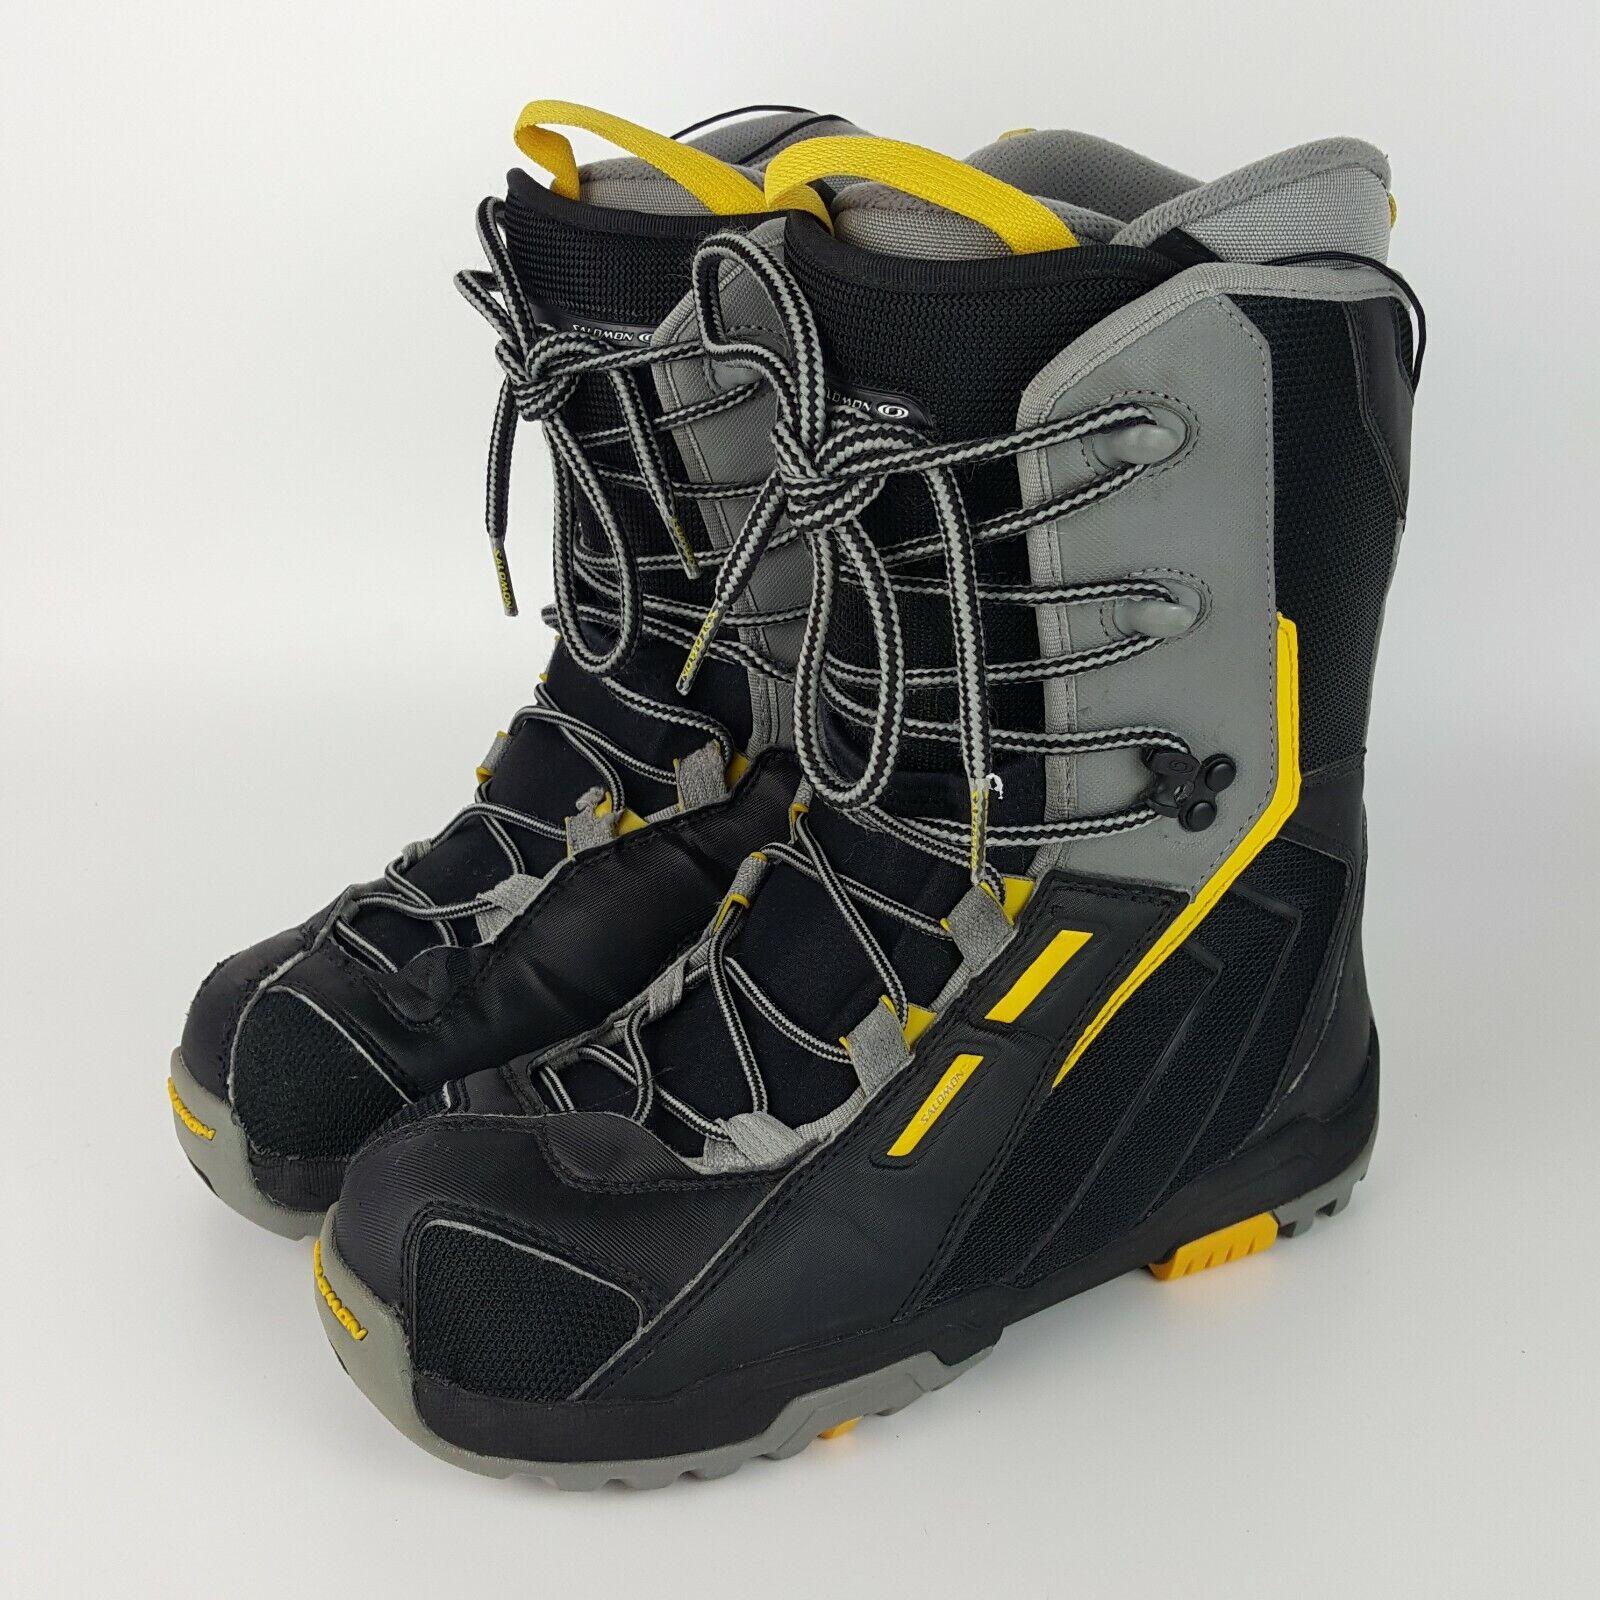 10 /& 11 NEW 2020 Salomon Malamute Snowboard Men/'s Boots US Size 9